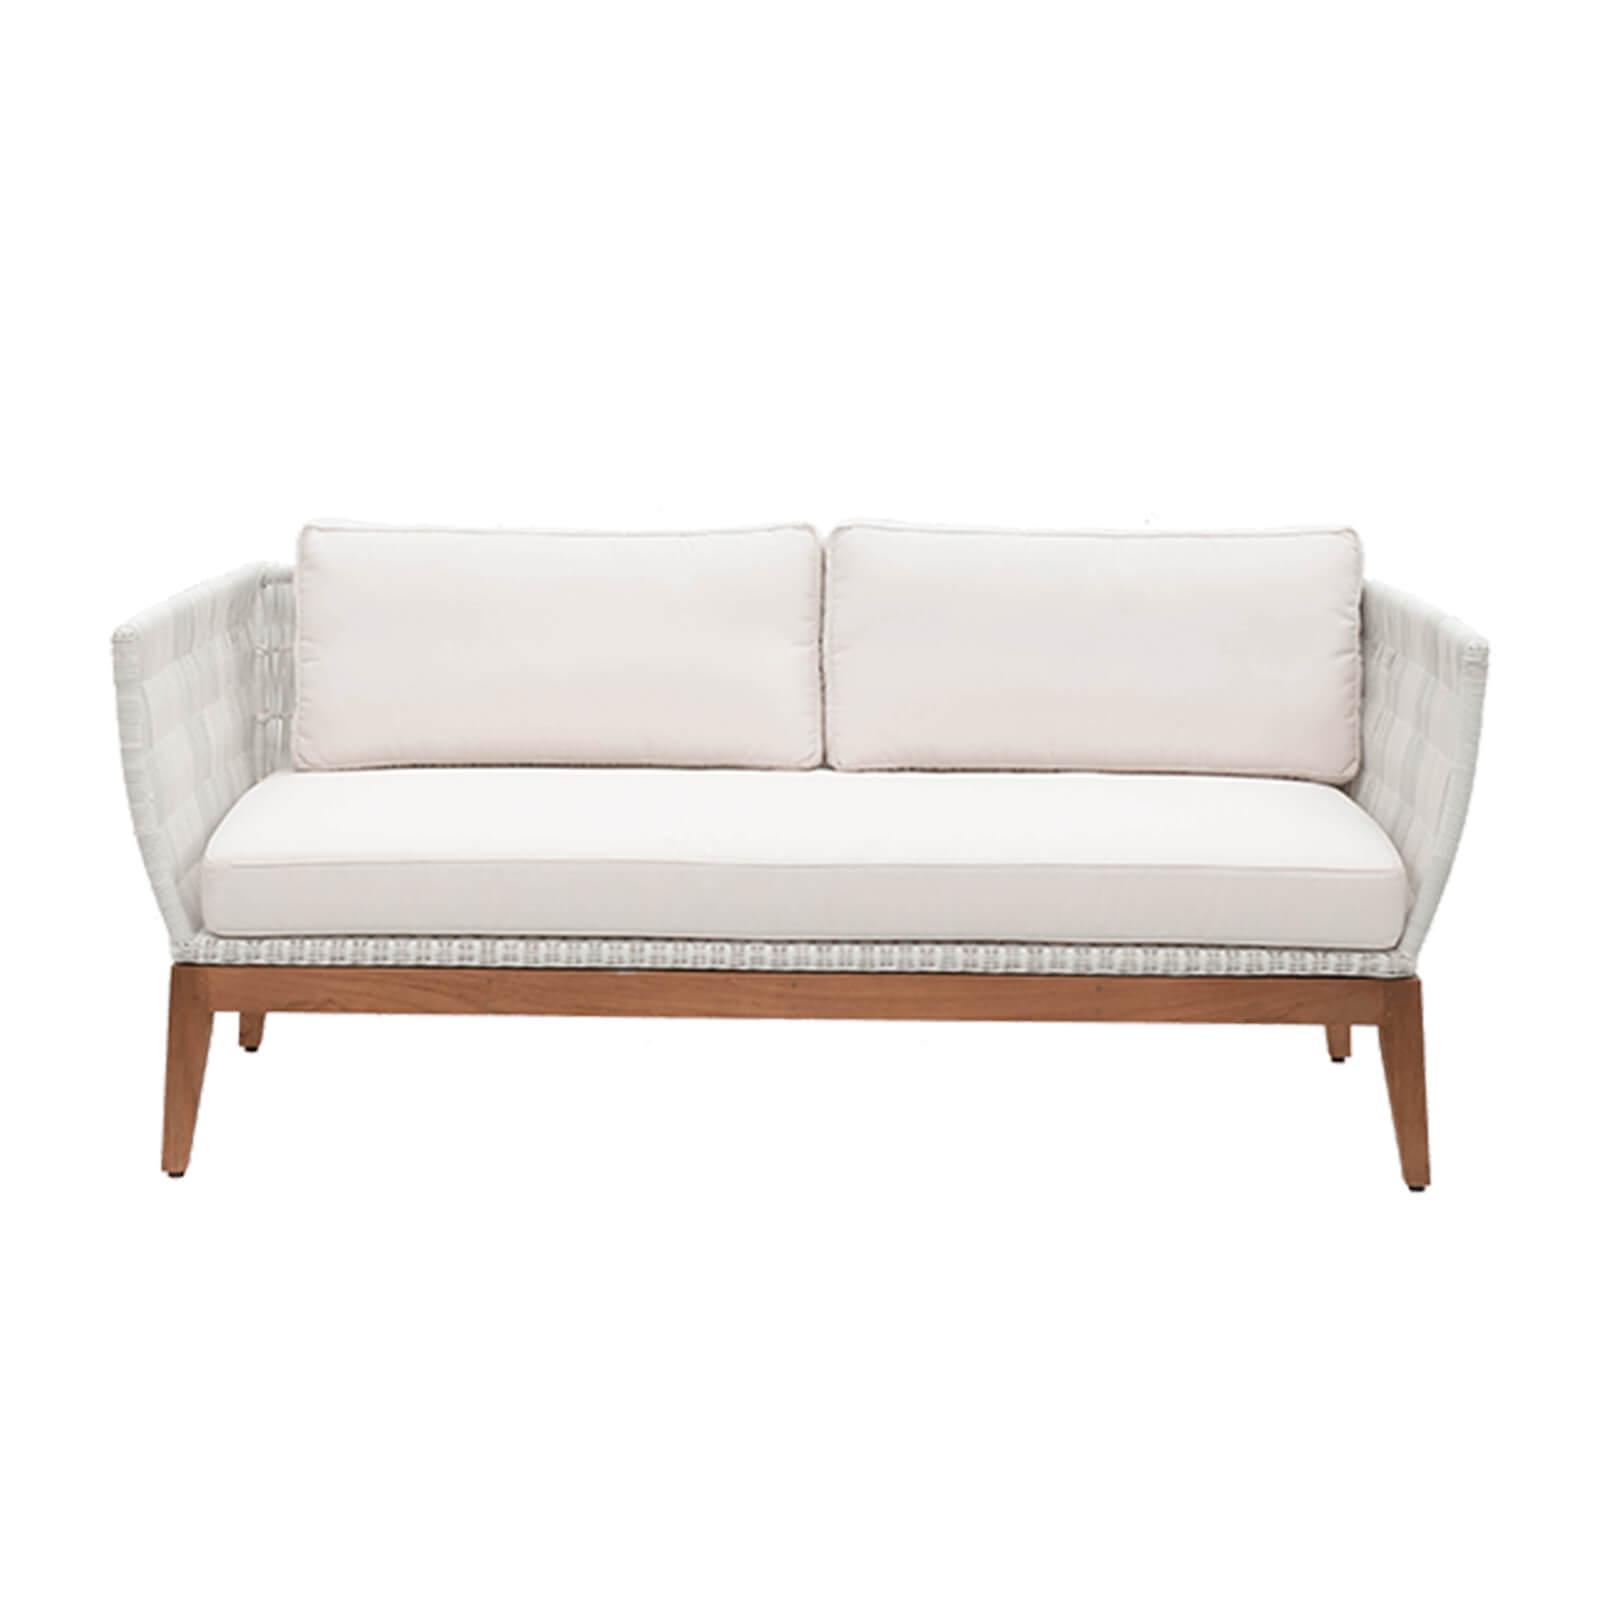 teak and white wicker sofa -1